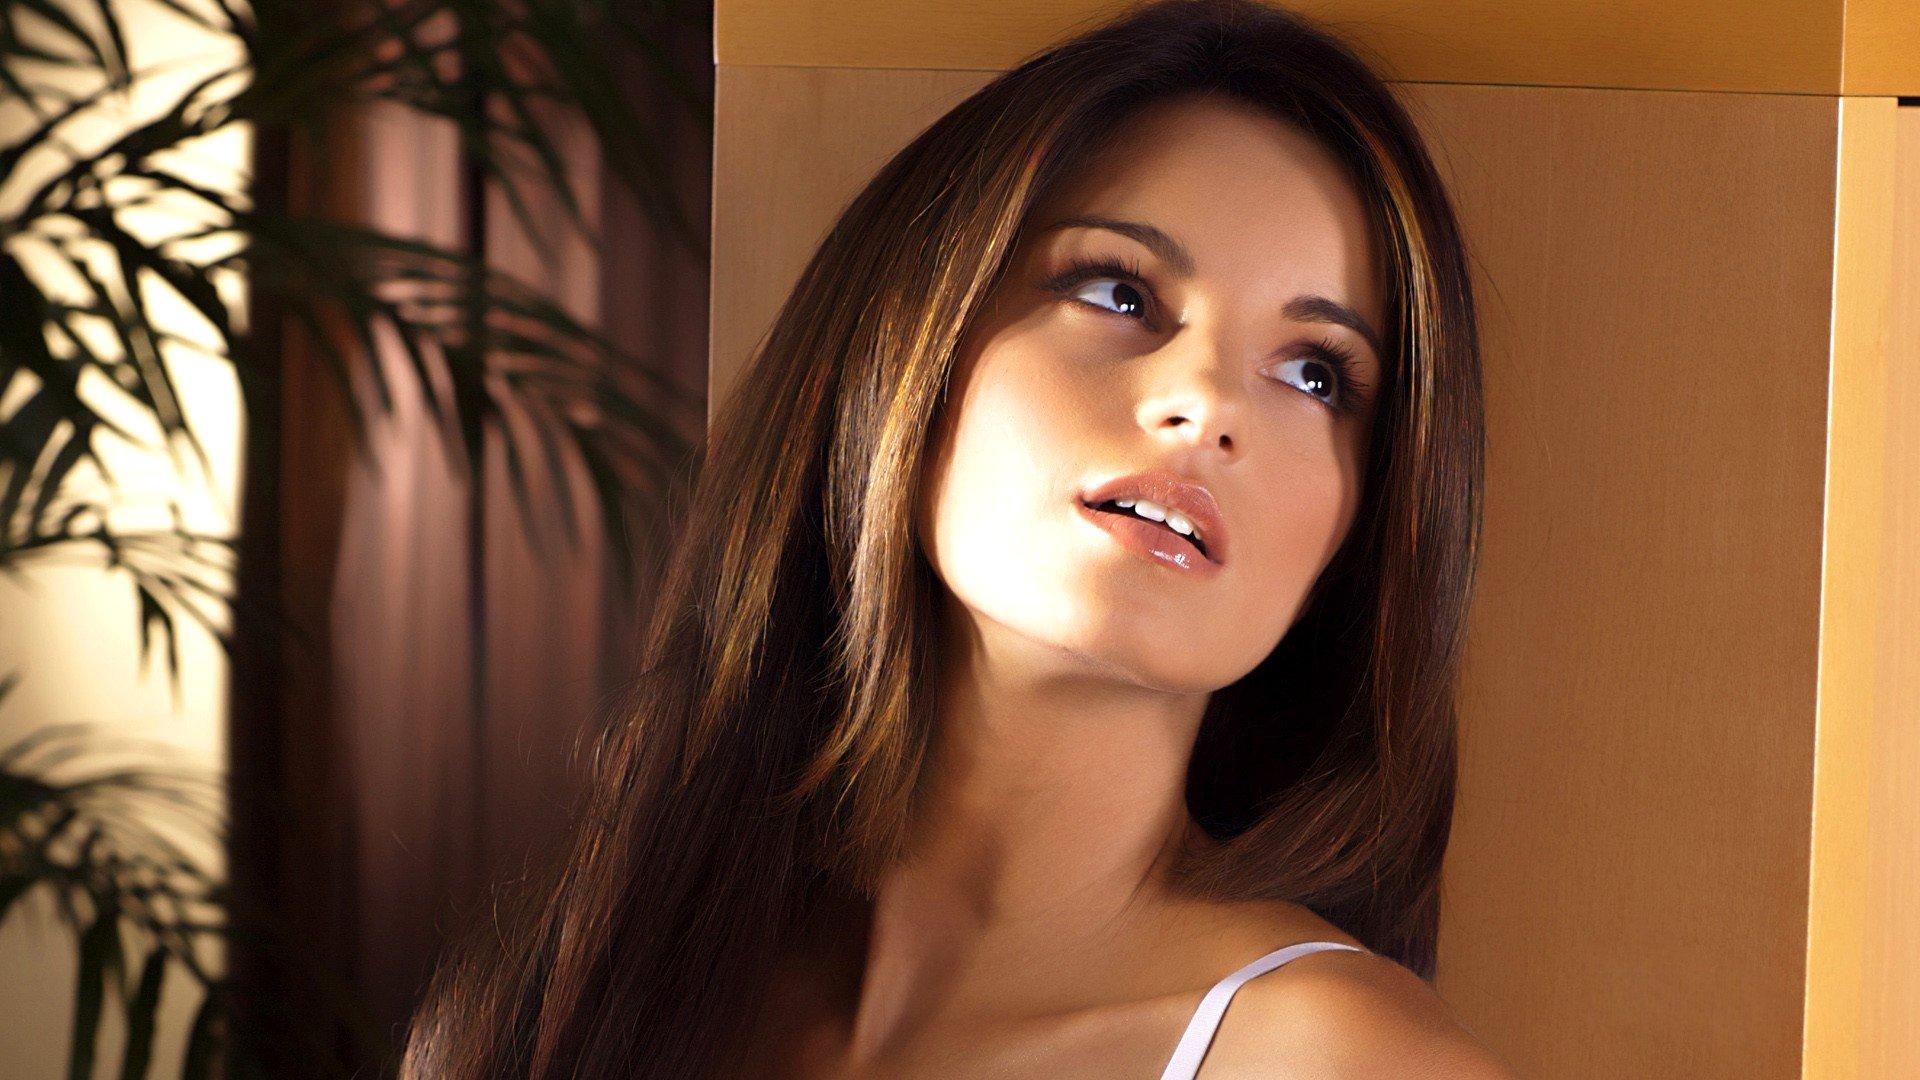 Красавицы модели видео фраза